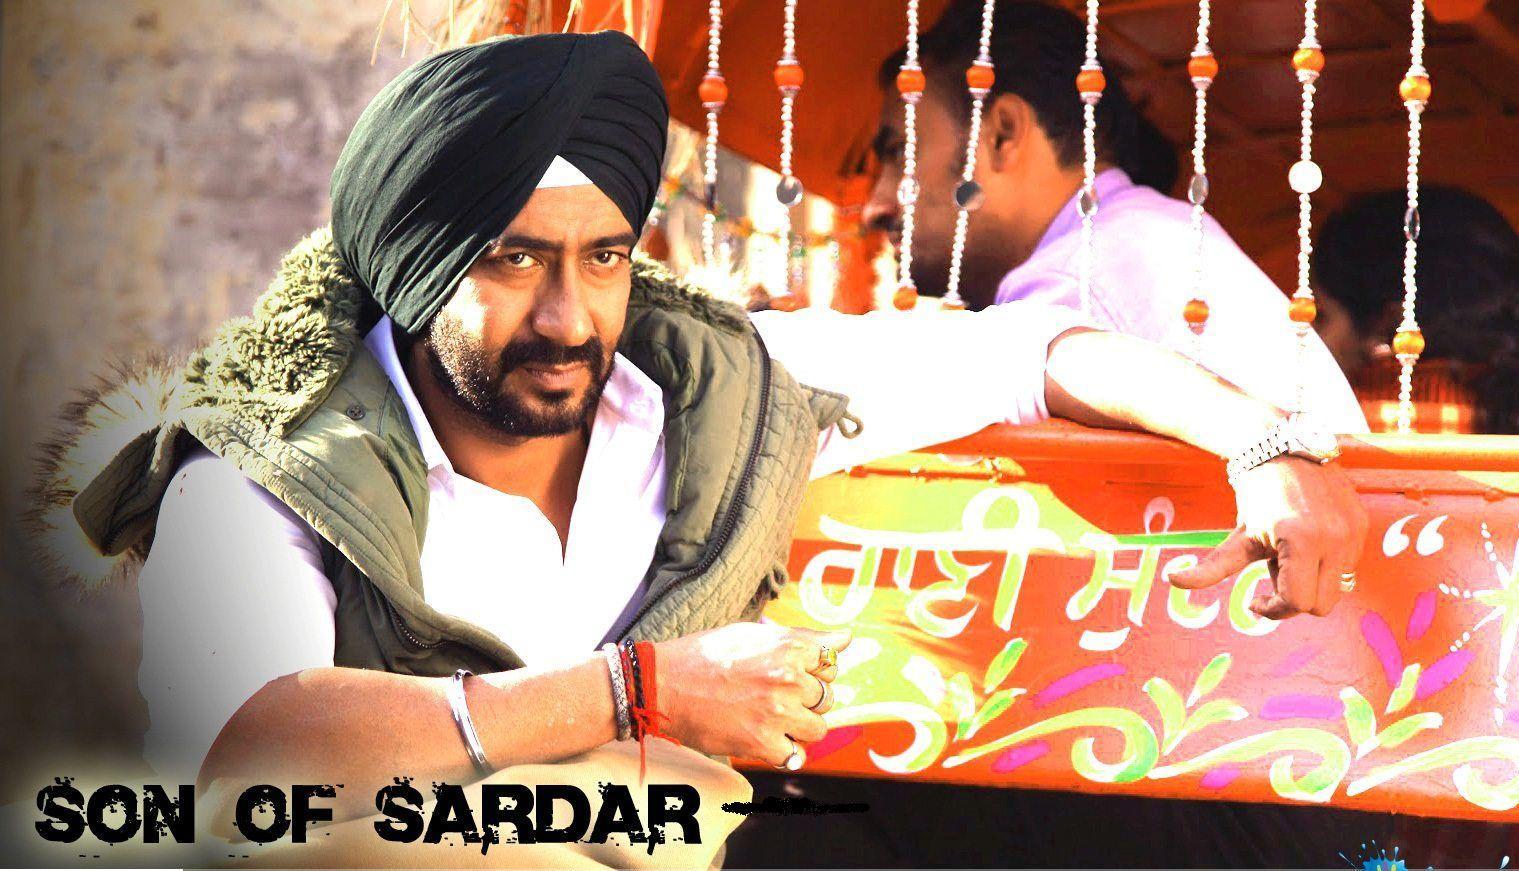 Son Of Sardar Movie Wallpapers Hd: January 2013